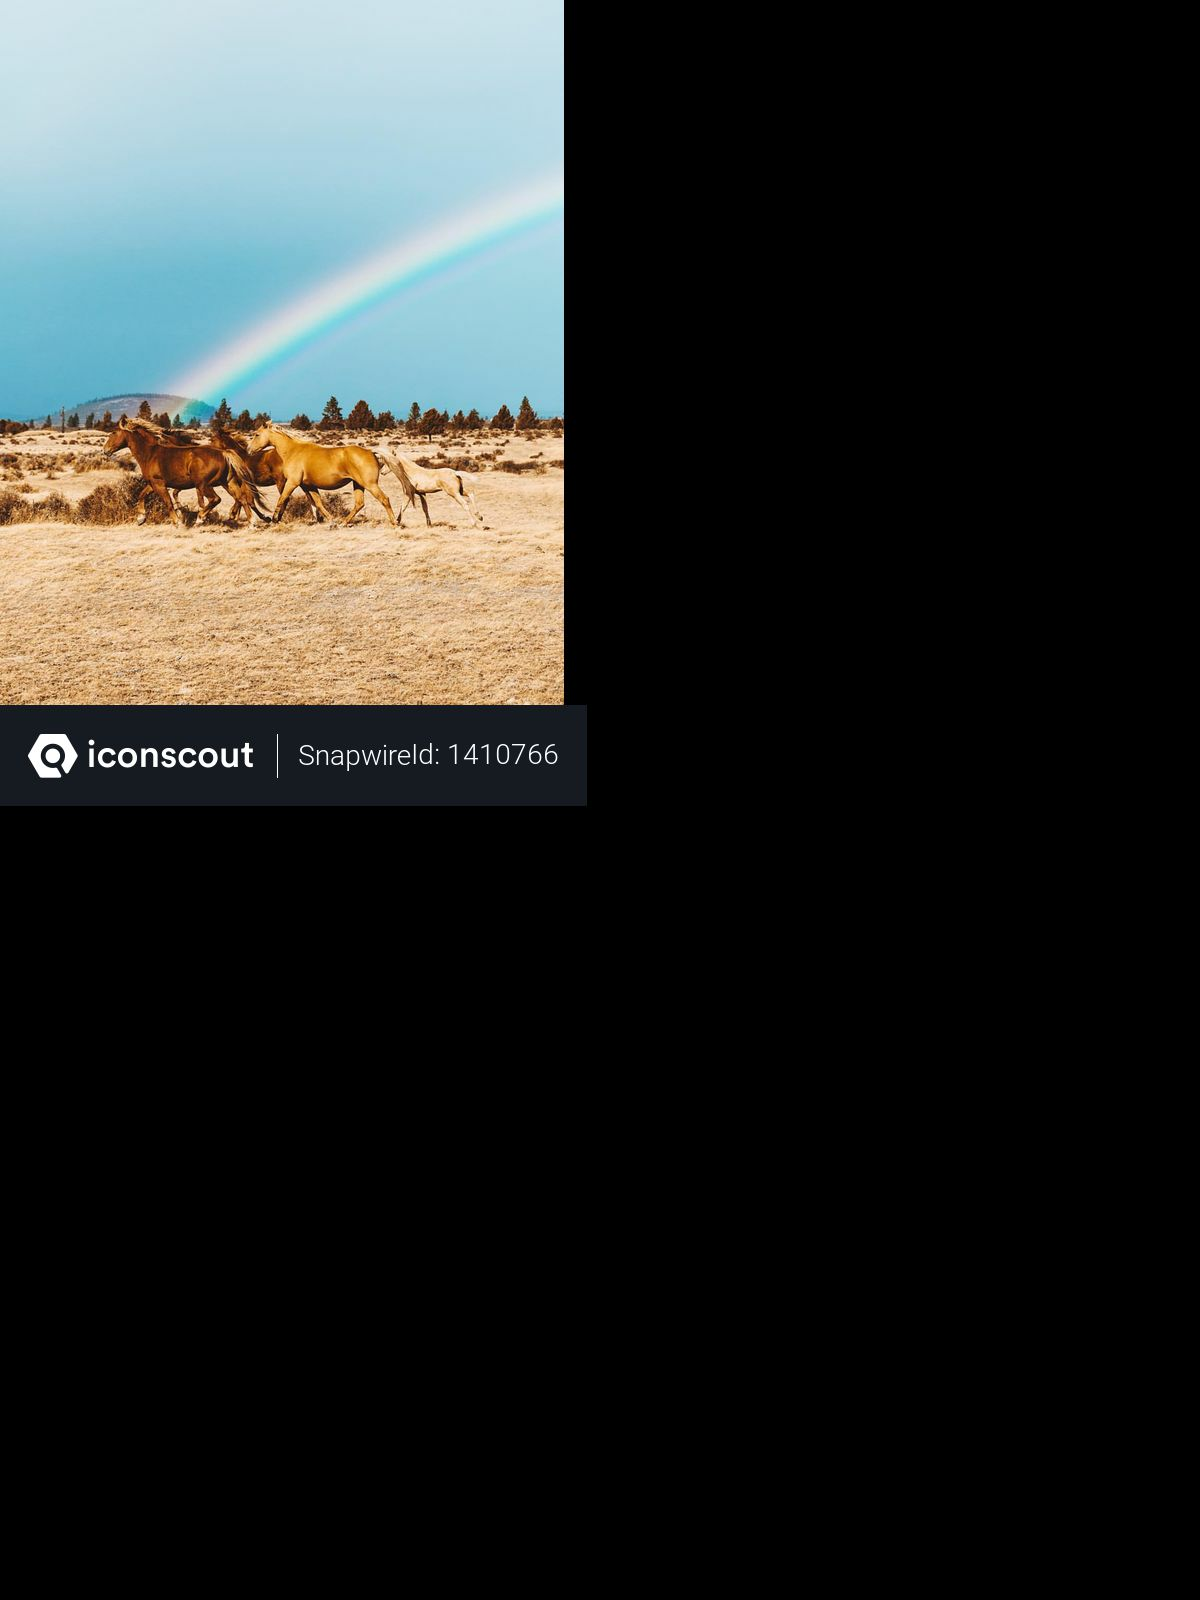 Horse and rainbow Photo